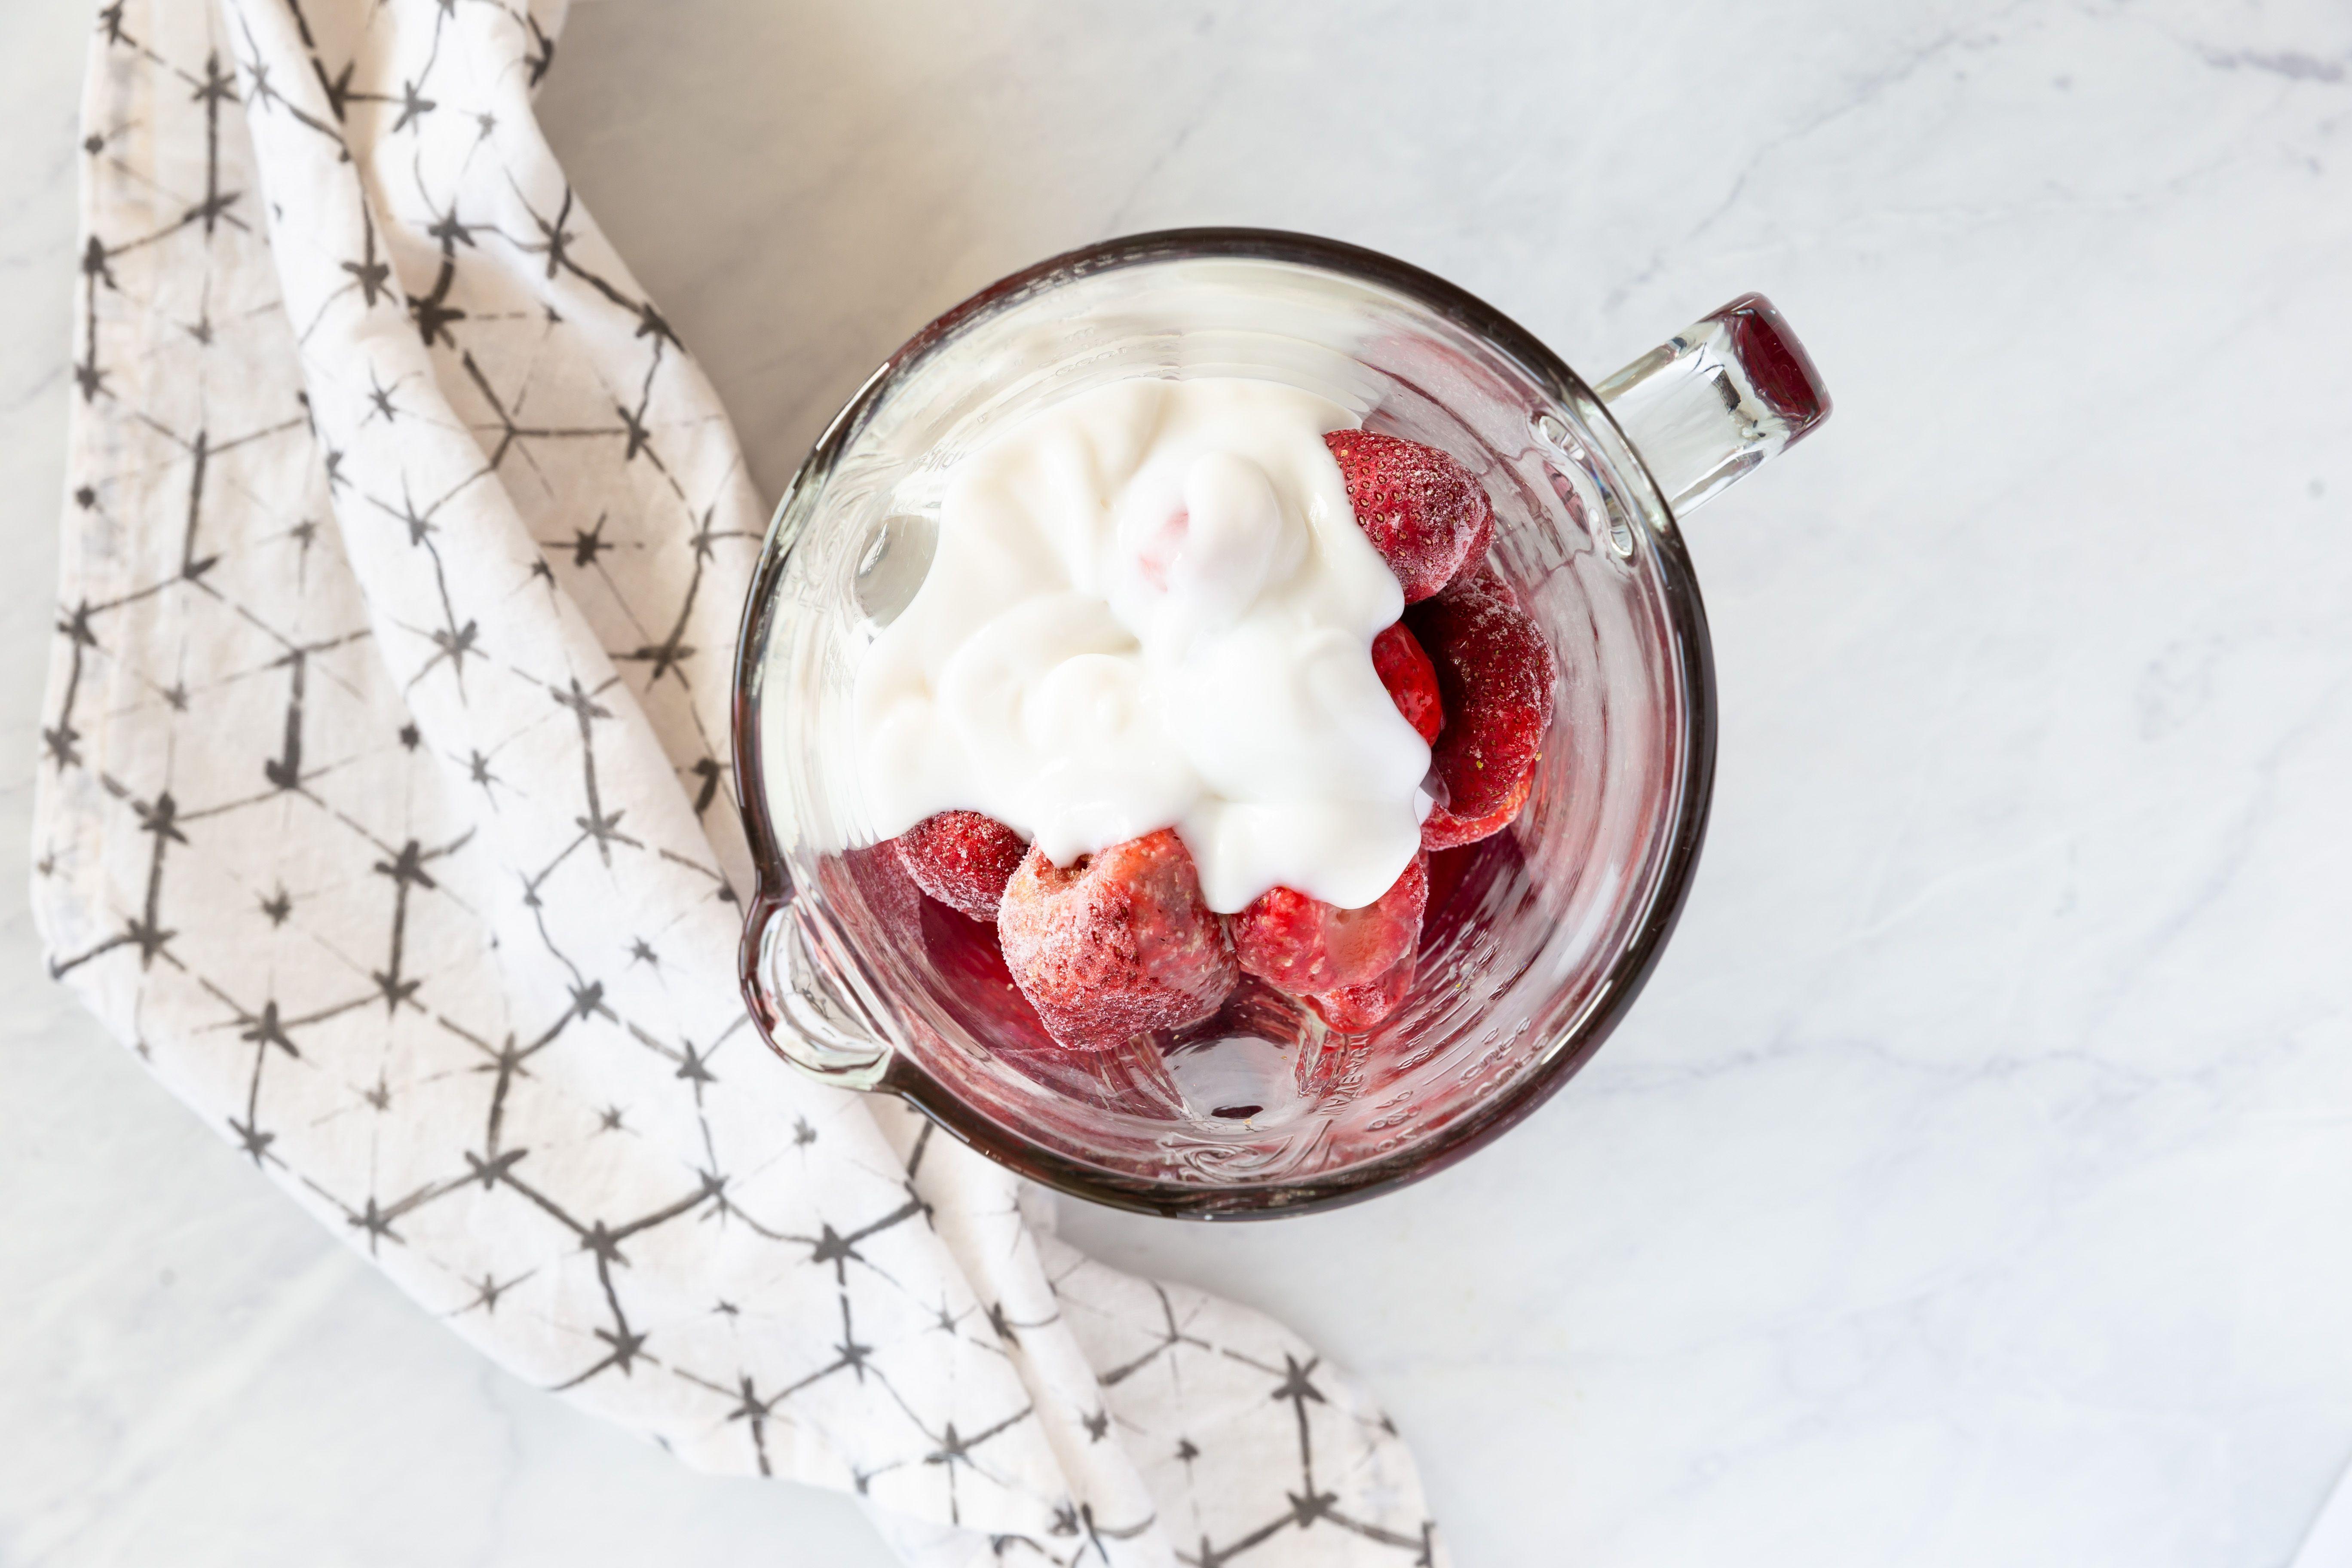 Strawberry smoothie ingredients in a blender